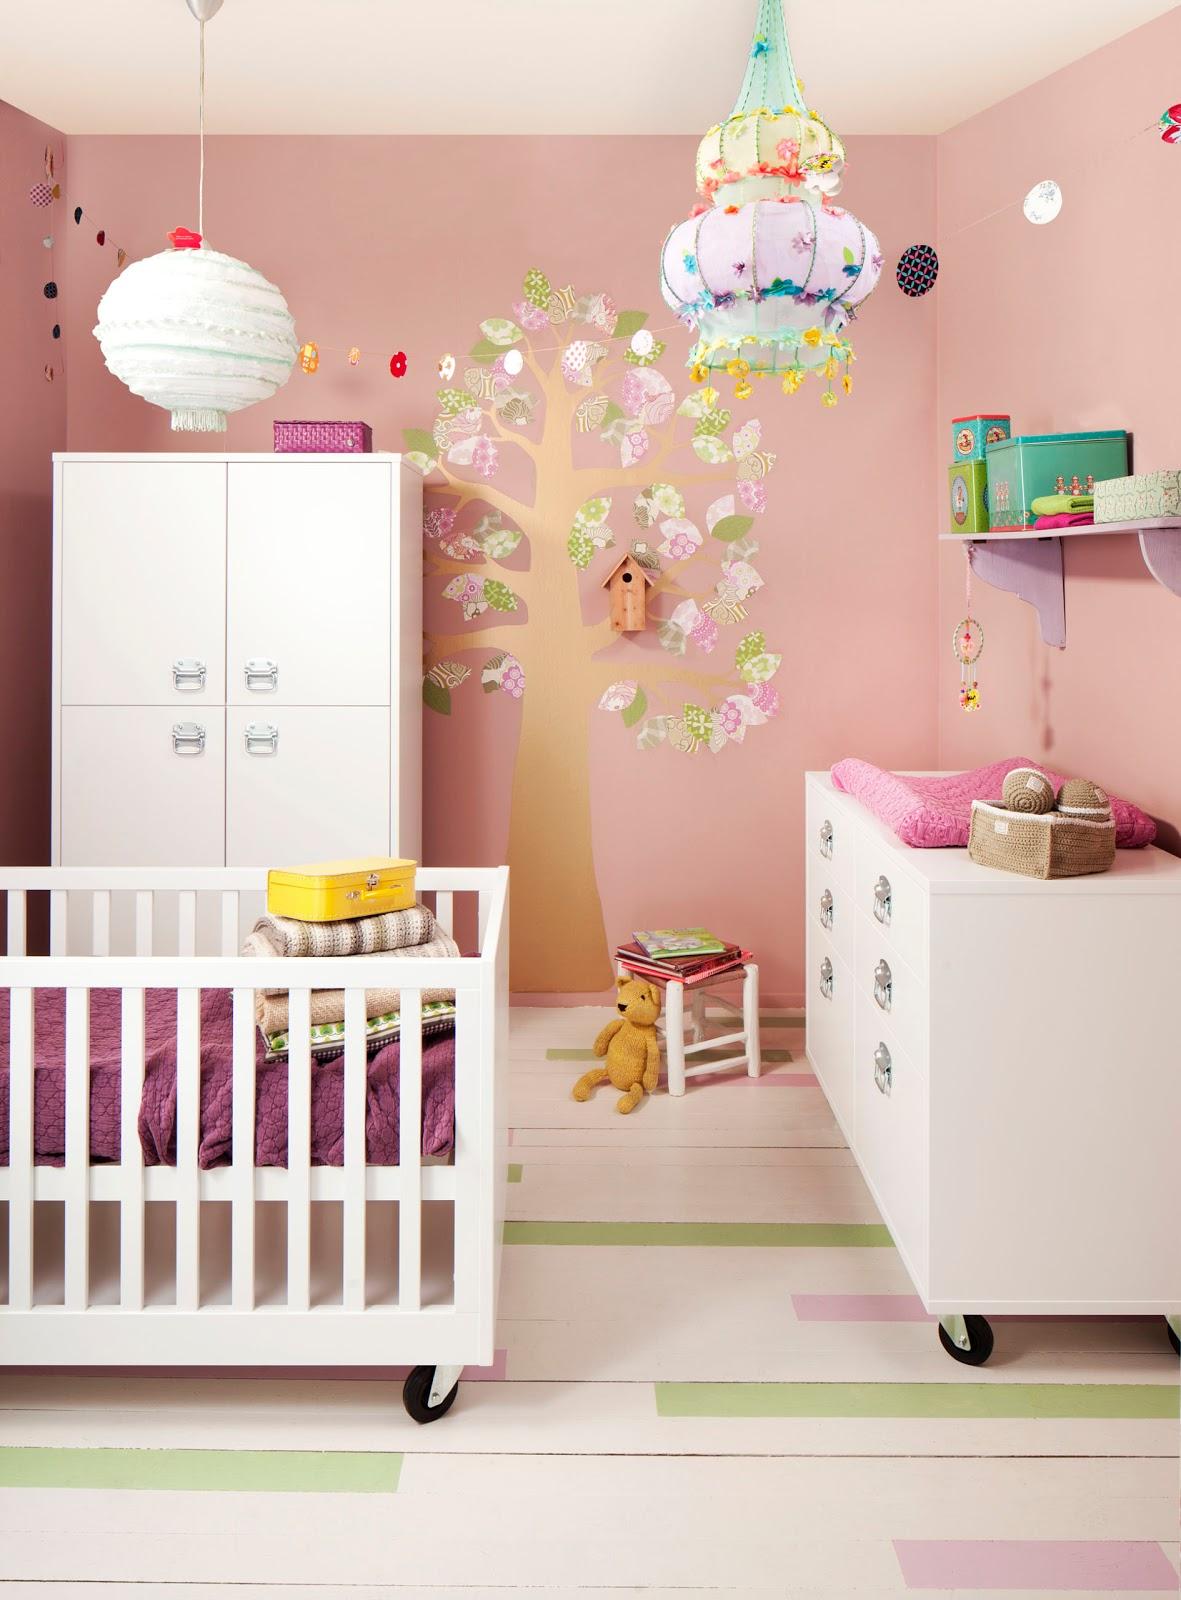 Dormitorios de ni os para espacios peque os decoracion de salones - Dormitorios infantiles pequenos ...